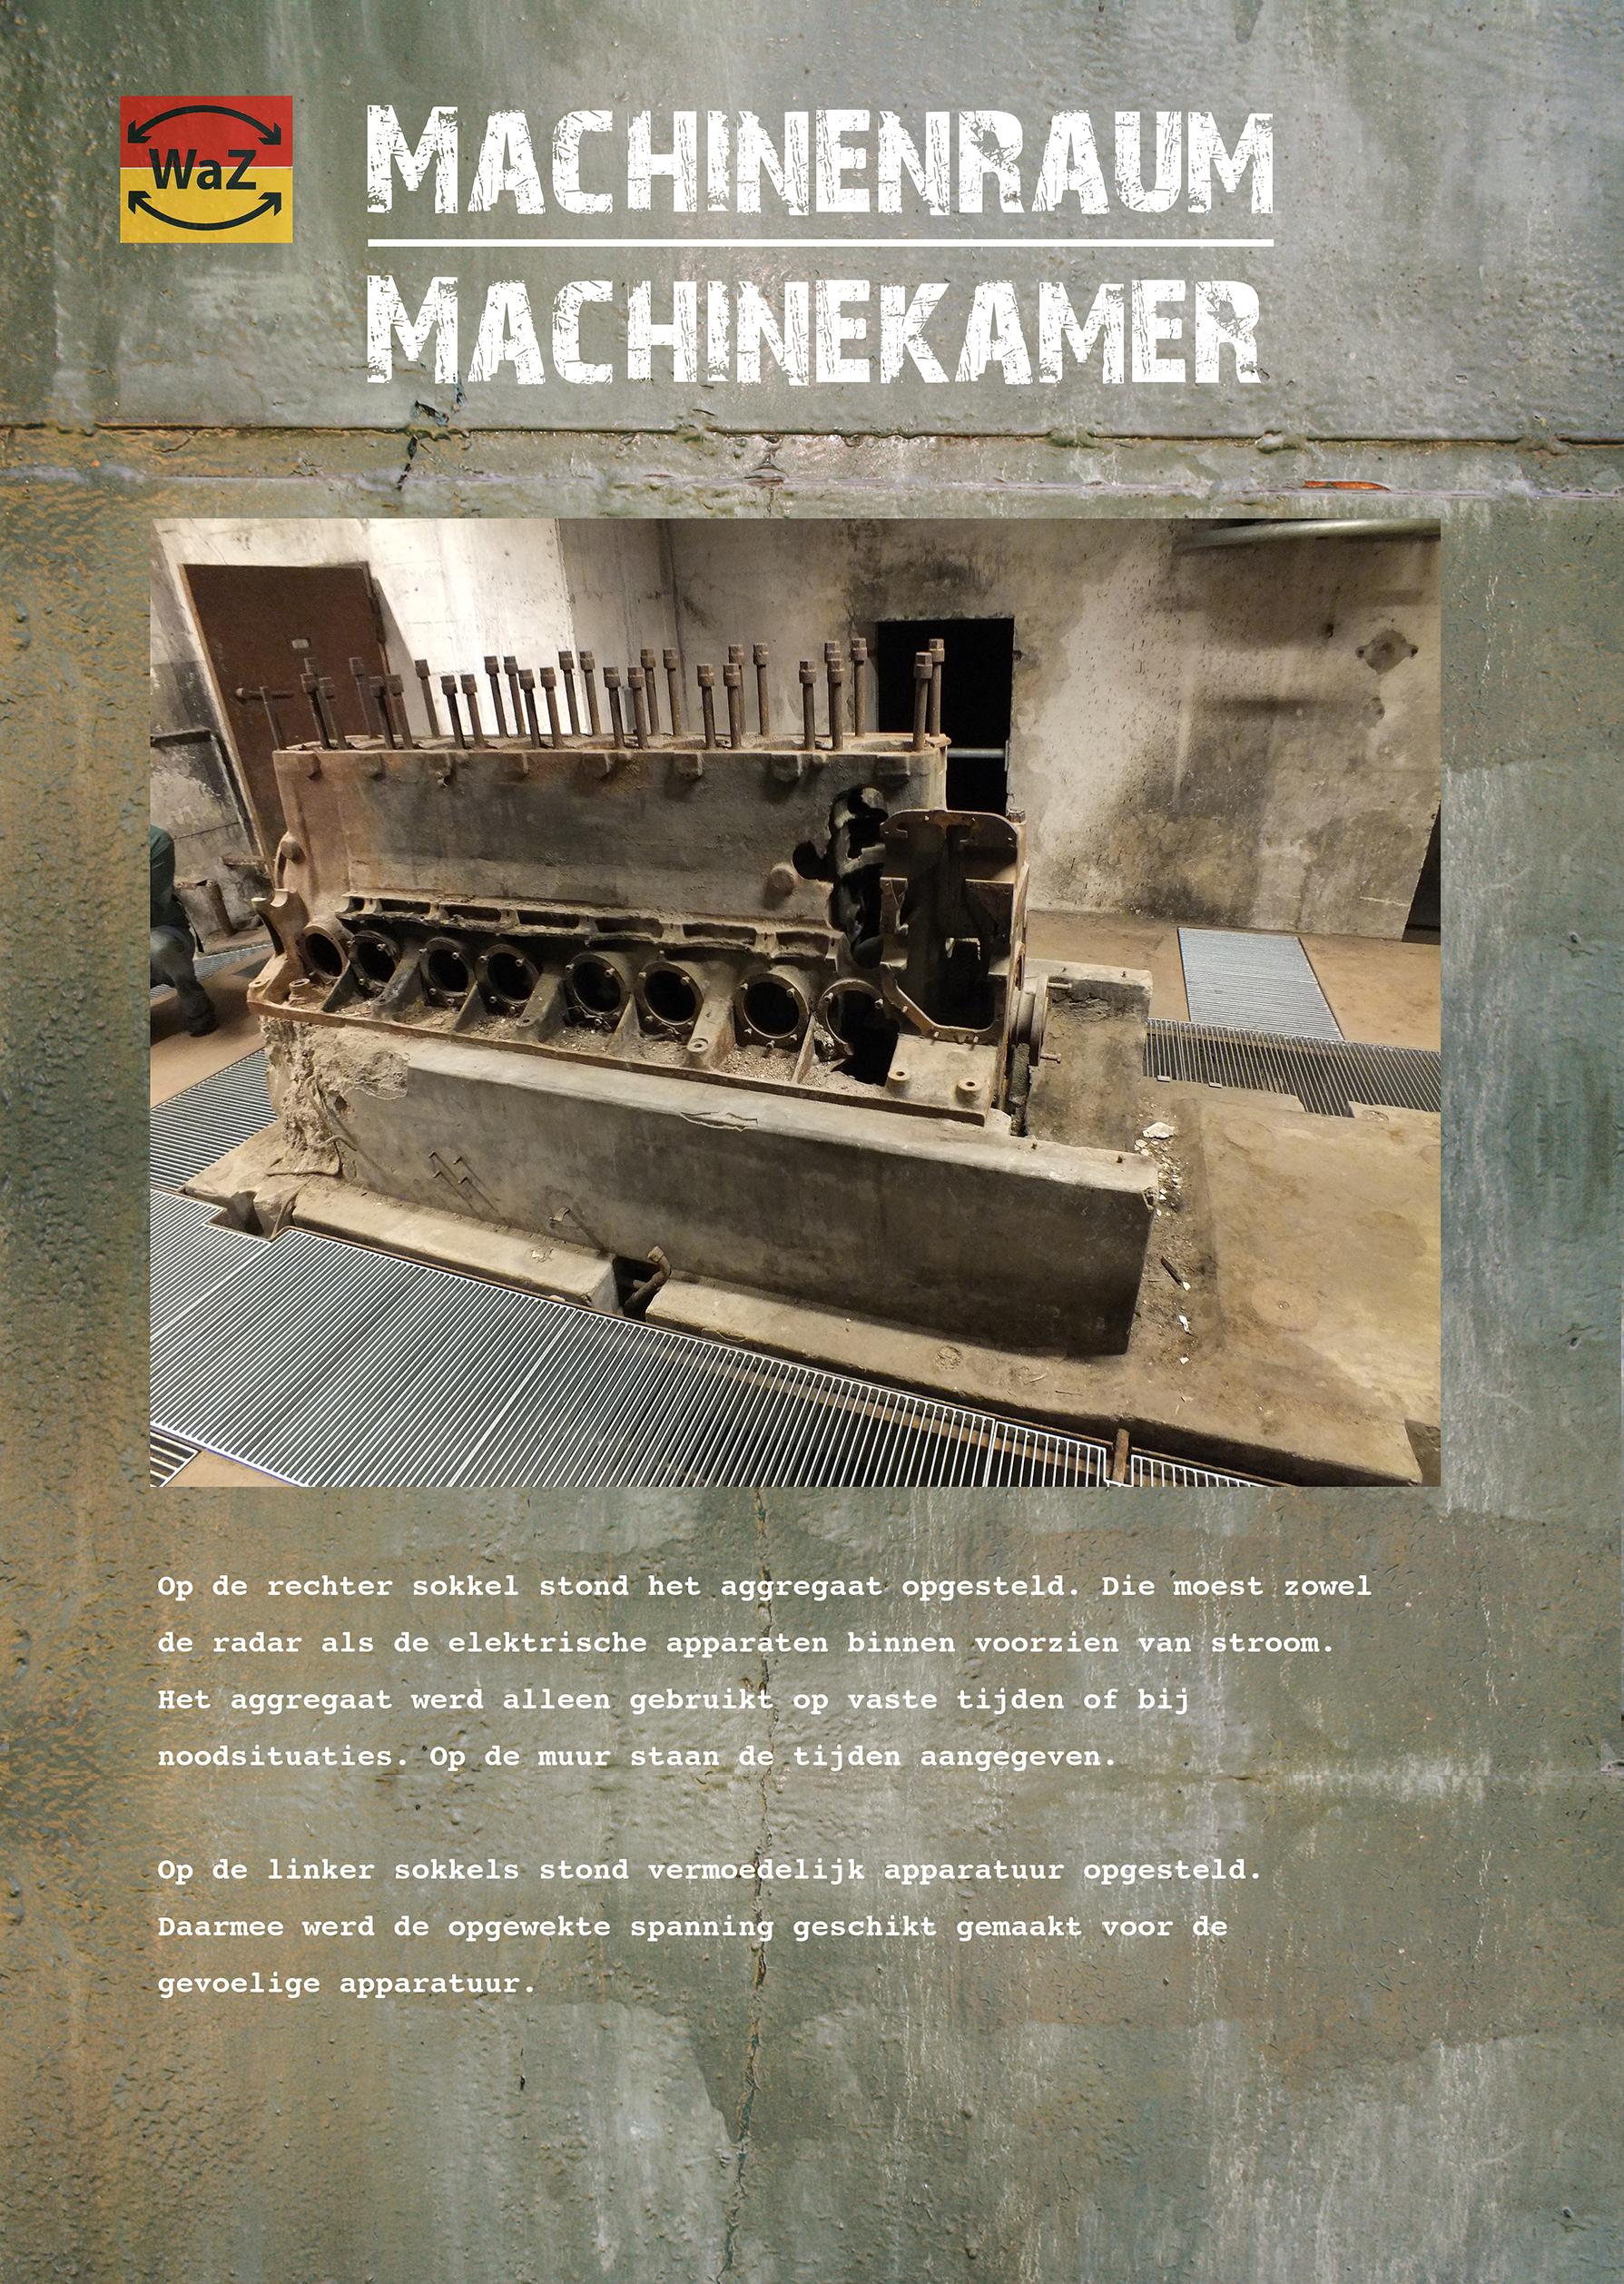 machinekamer2